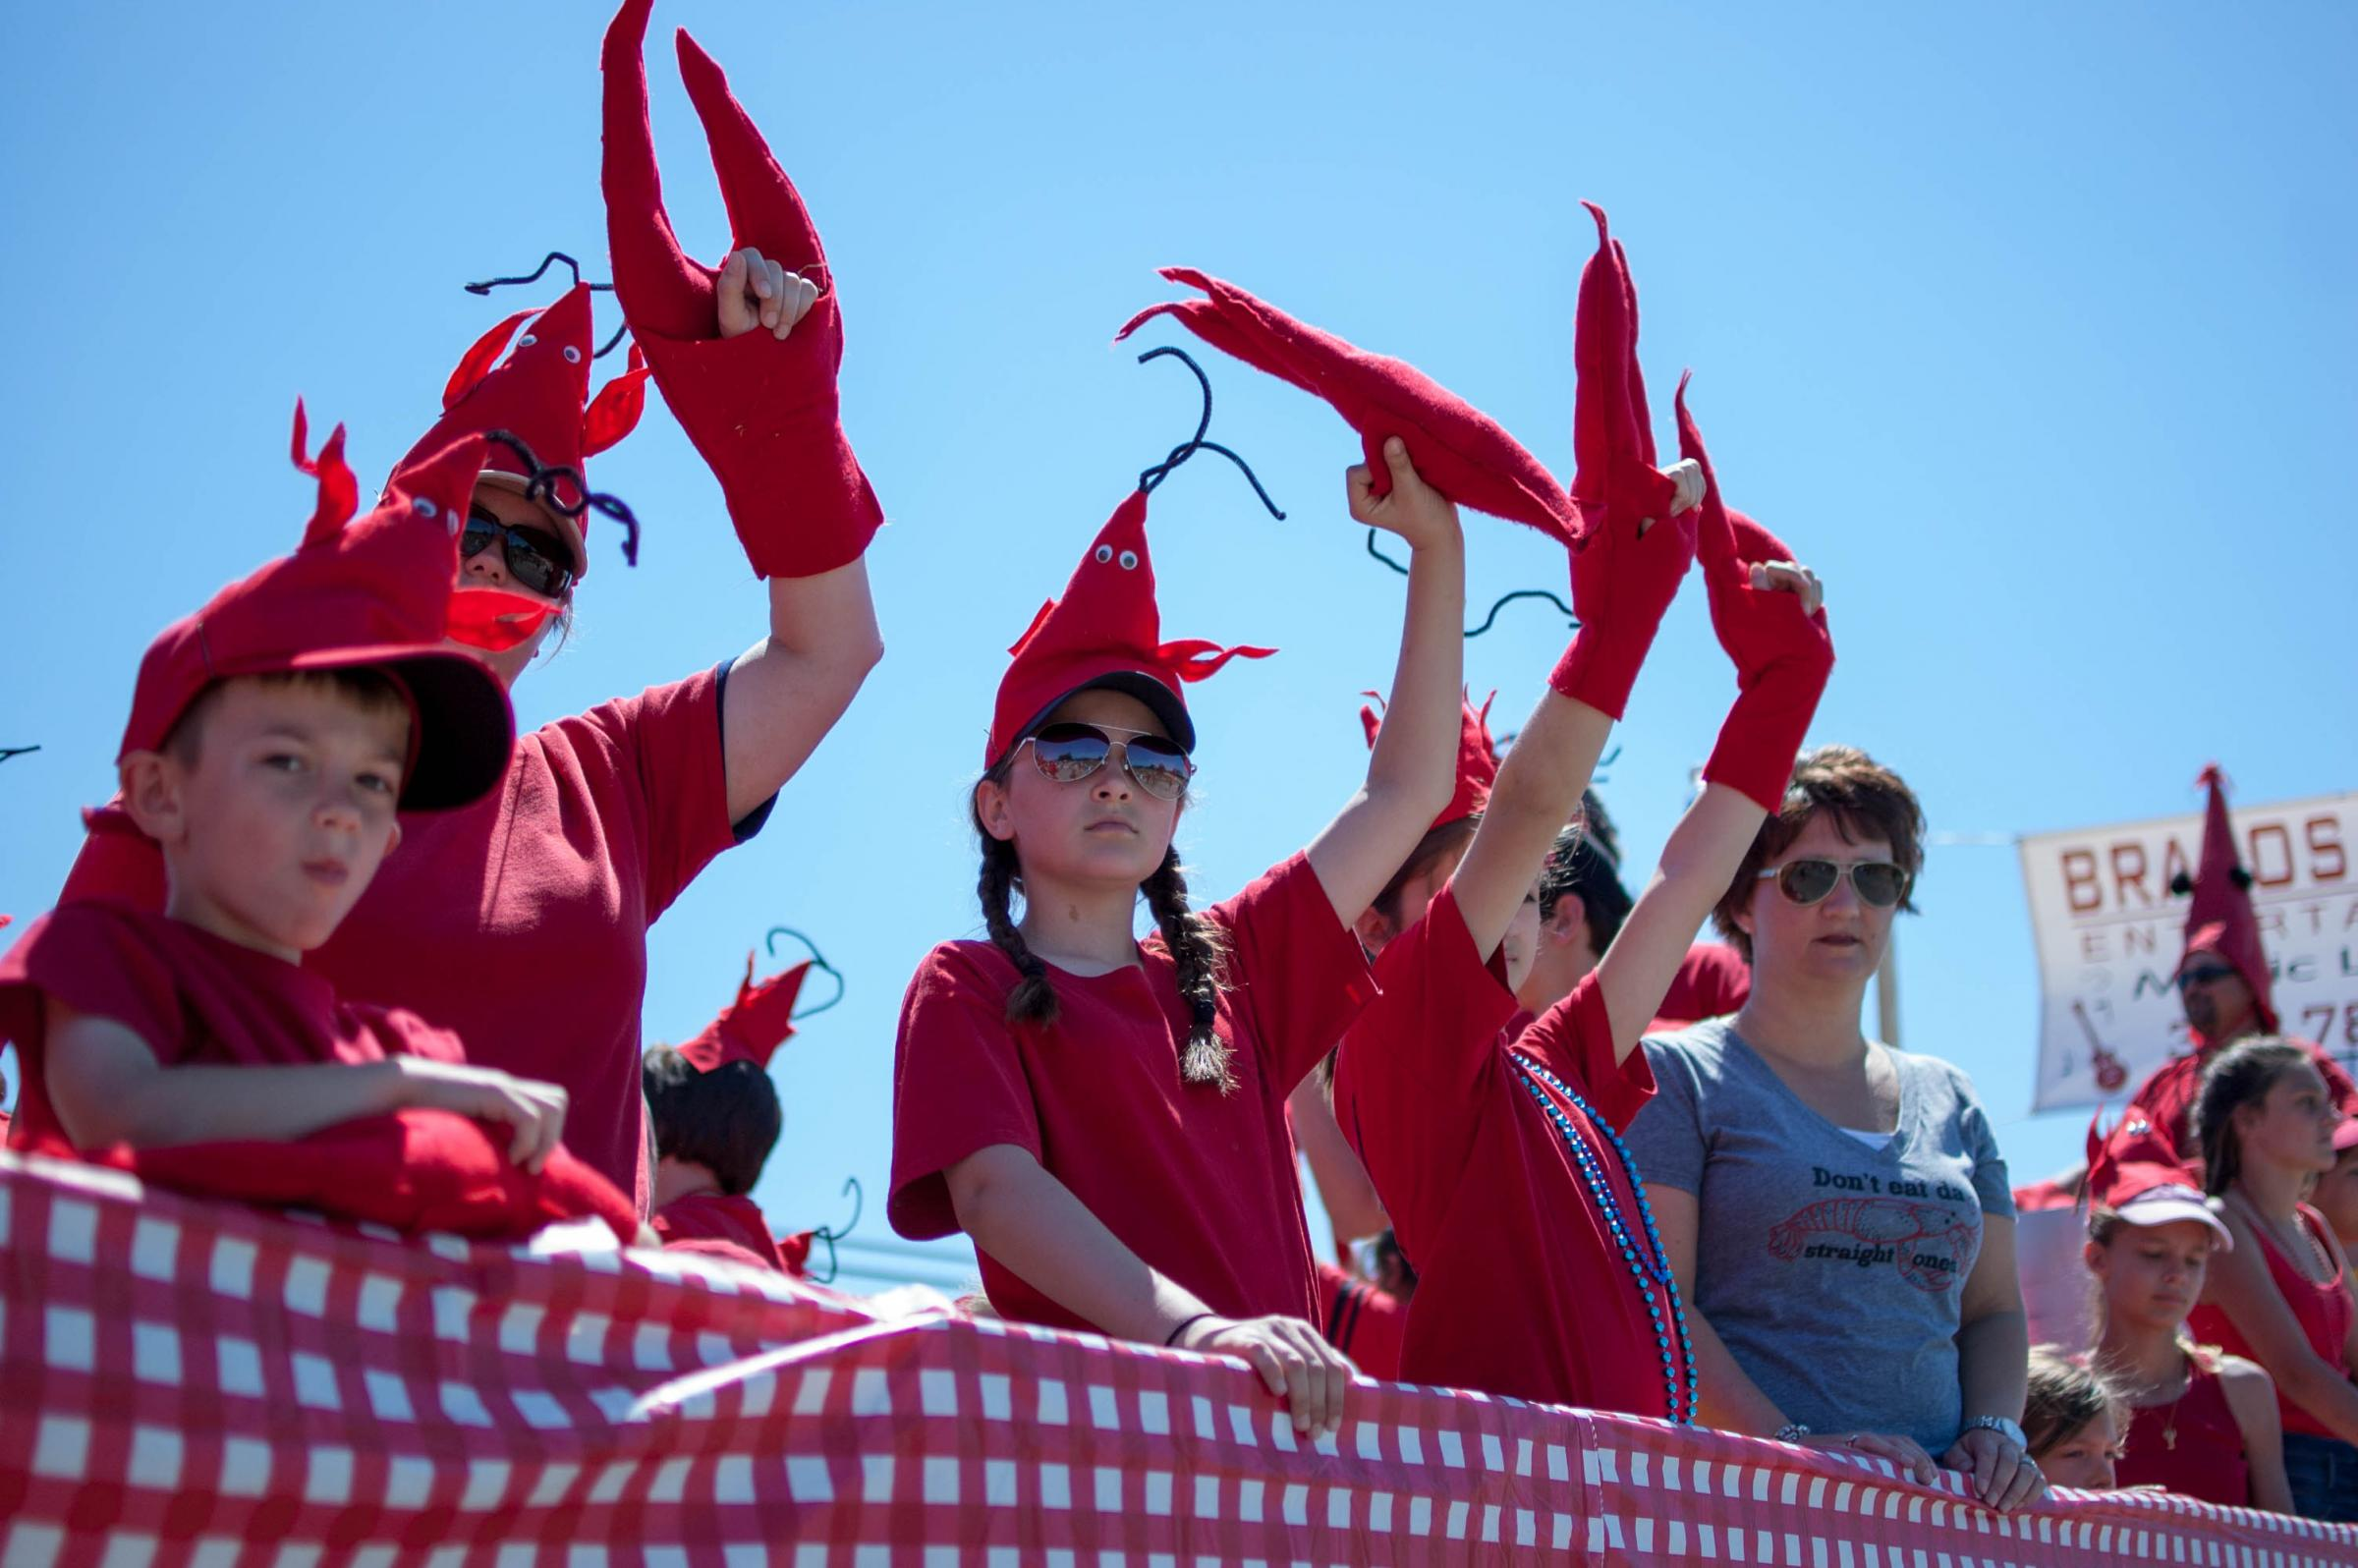 Breaux Bridge Crawfish Festival 2020.The Crawfish Festival Sights Sounds And History Wwno